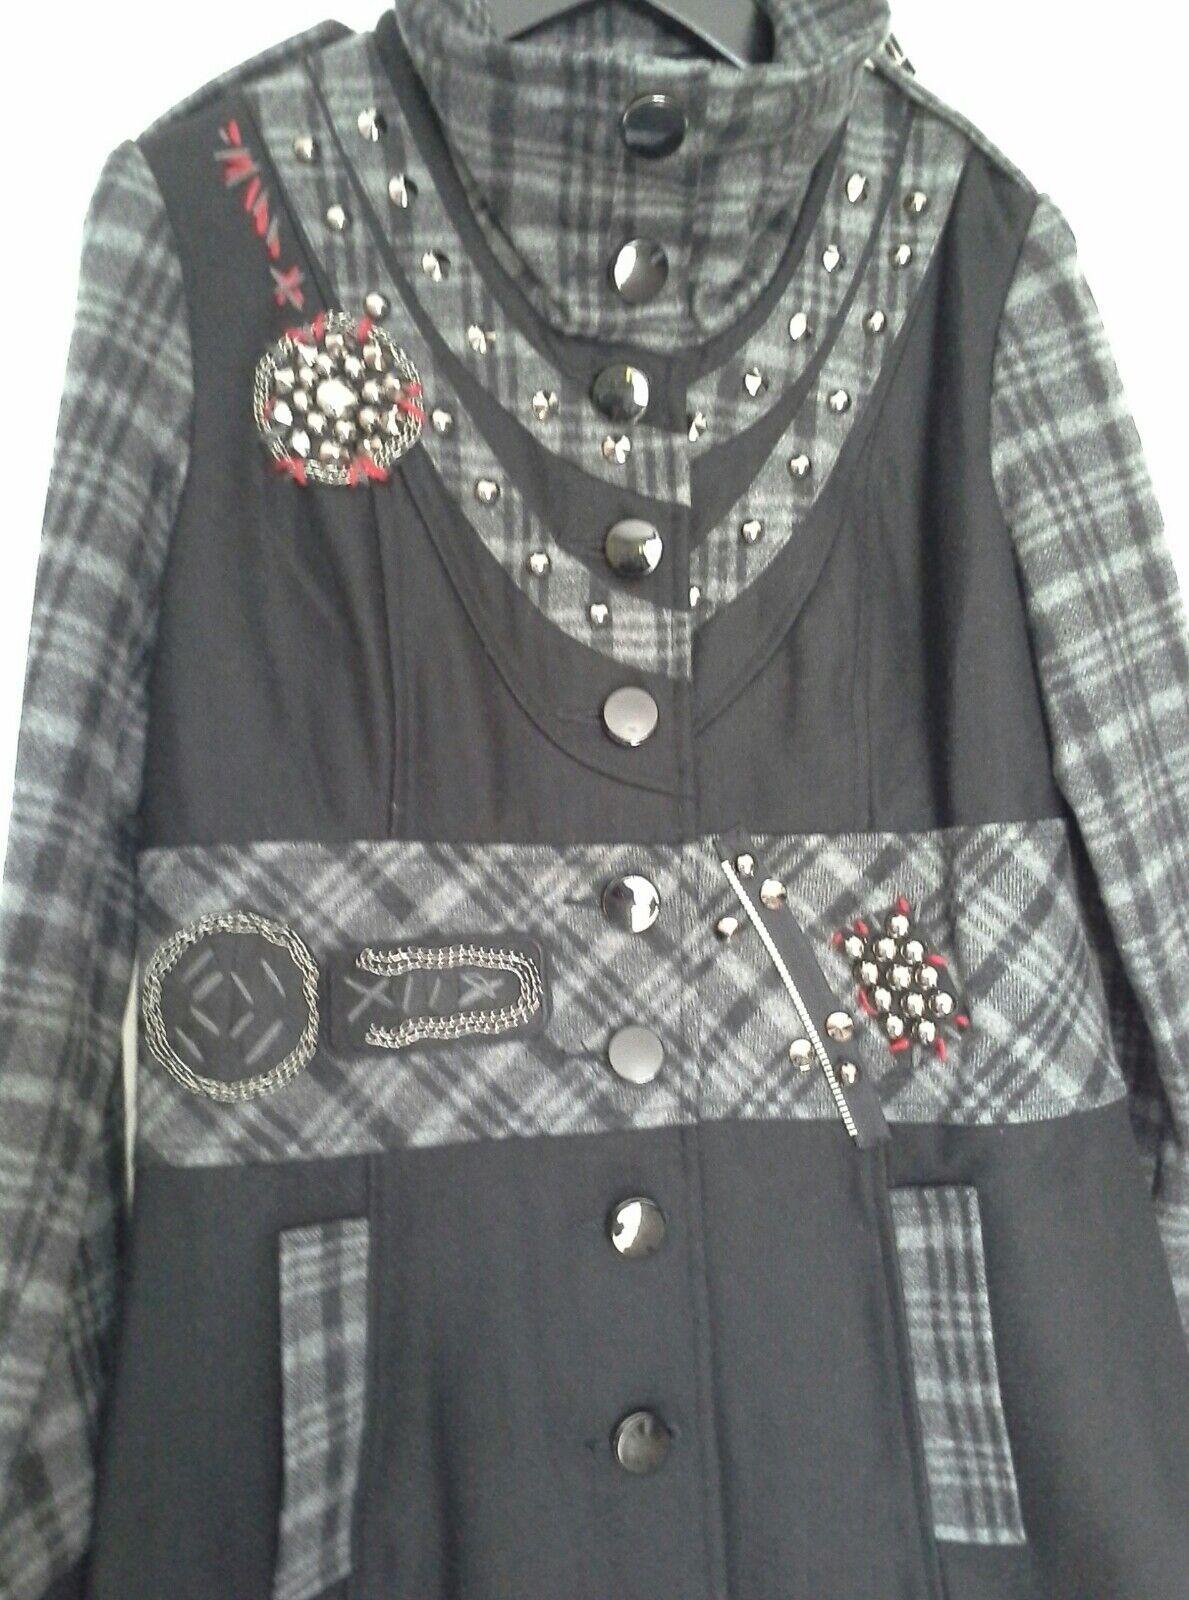 Kessley Embellished Coat Medium RARE RARE RARE 6aaf37